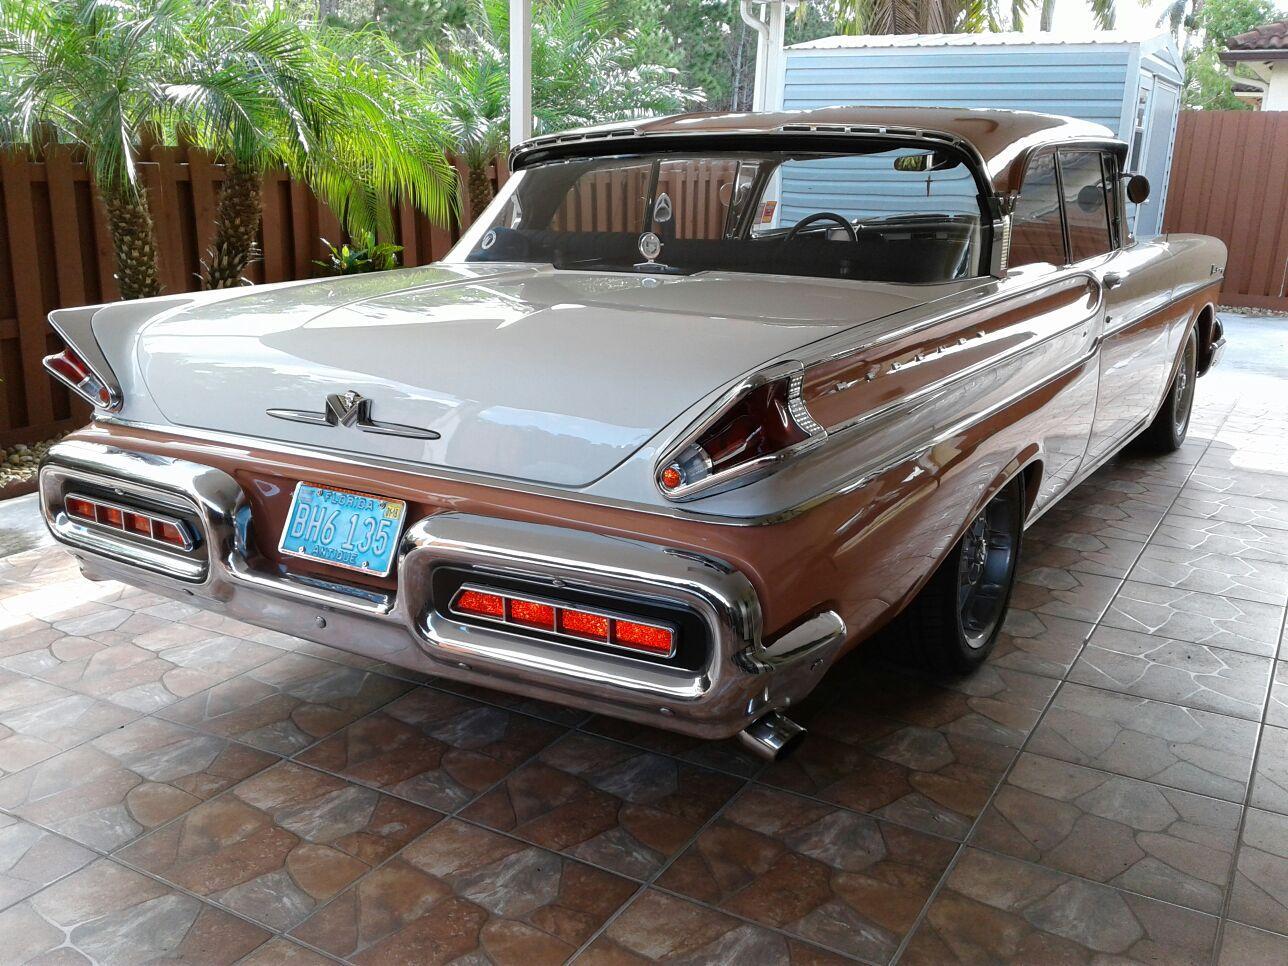 Mercury 1957, perfect condition.